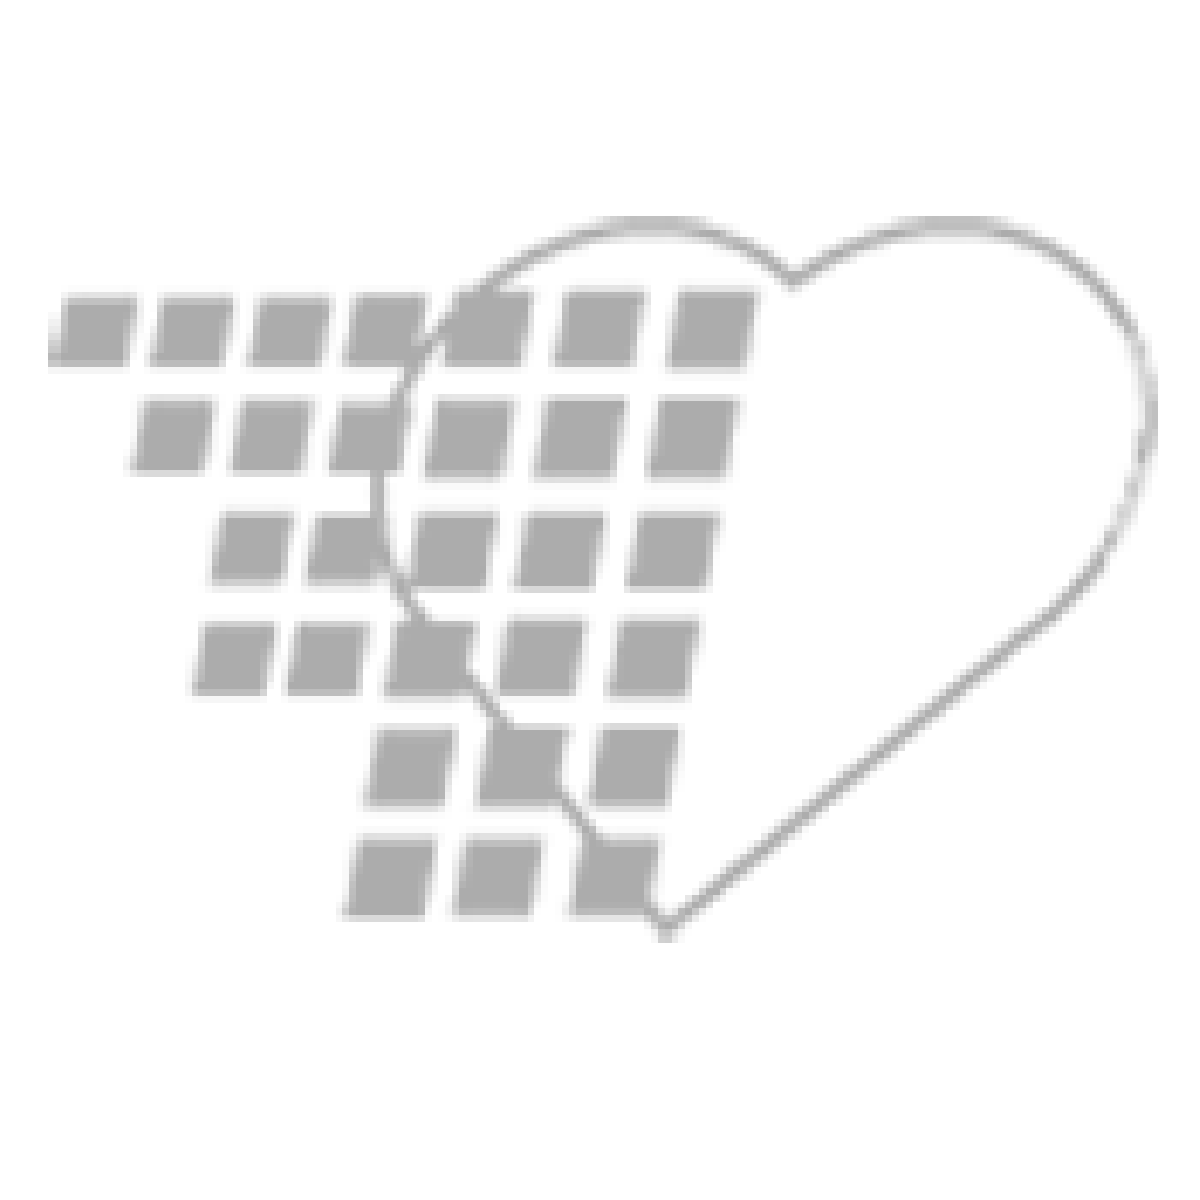 06-93-0091 Demo Dose® Pioglitazon 30 mg - 100 Pills/Bottle